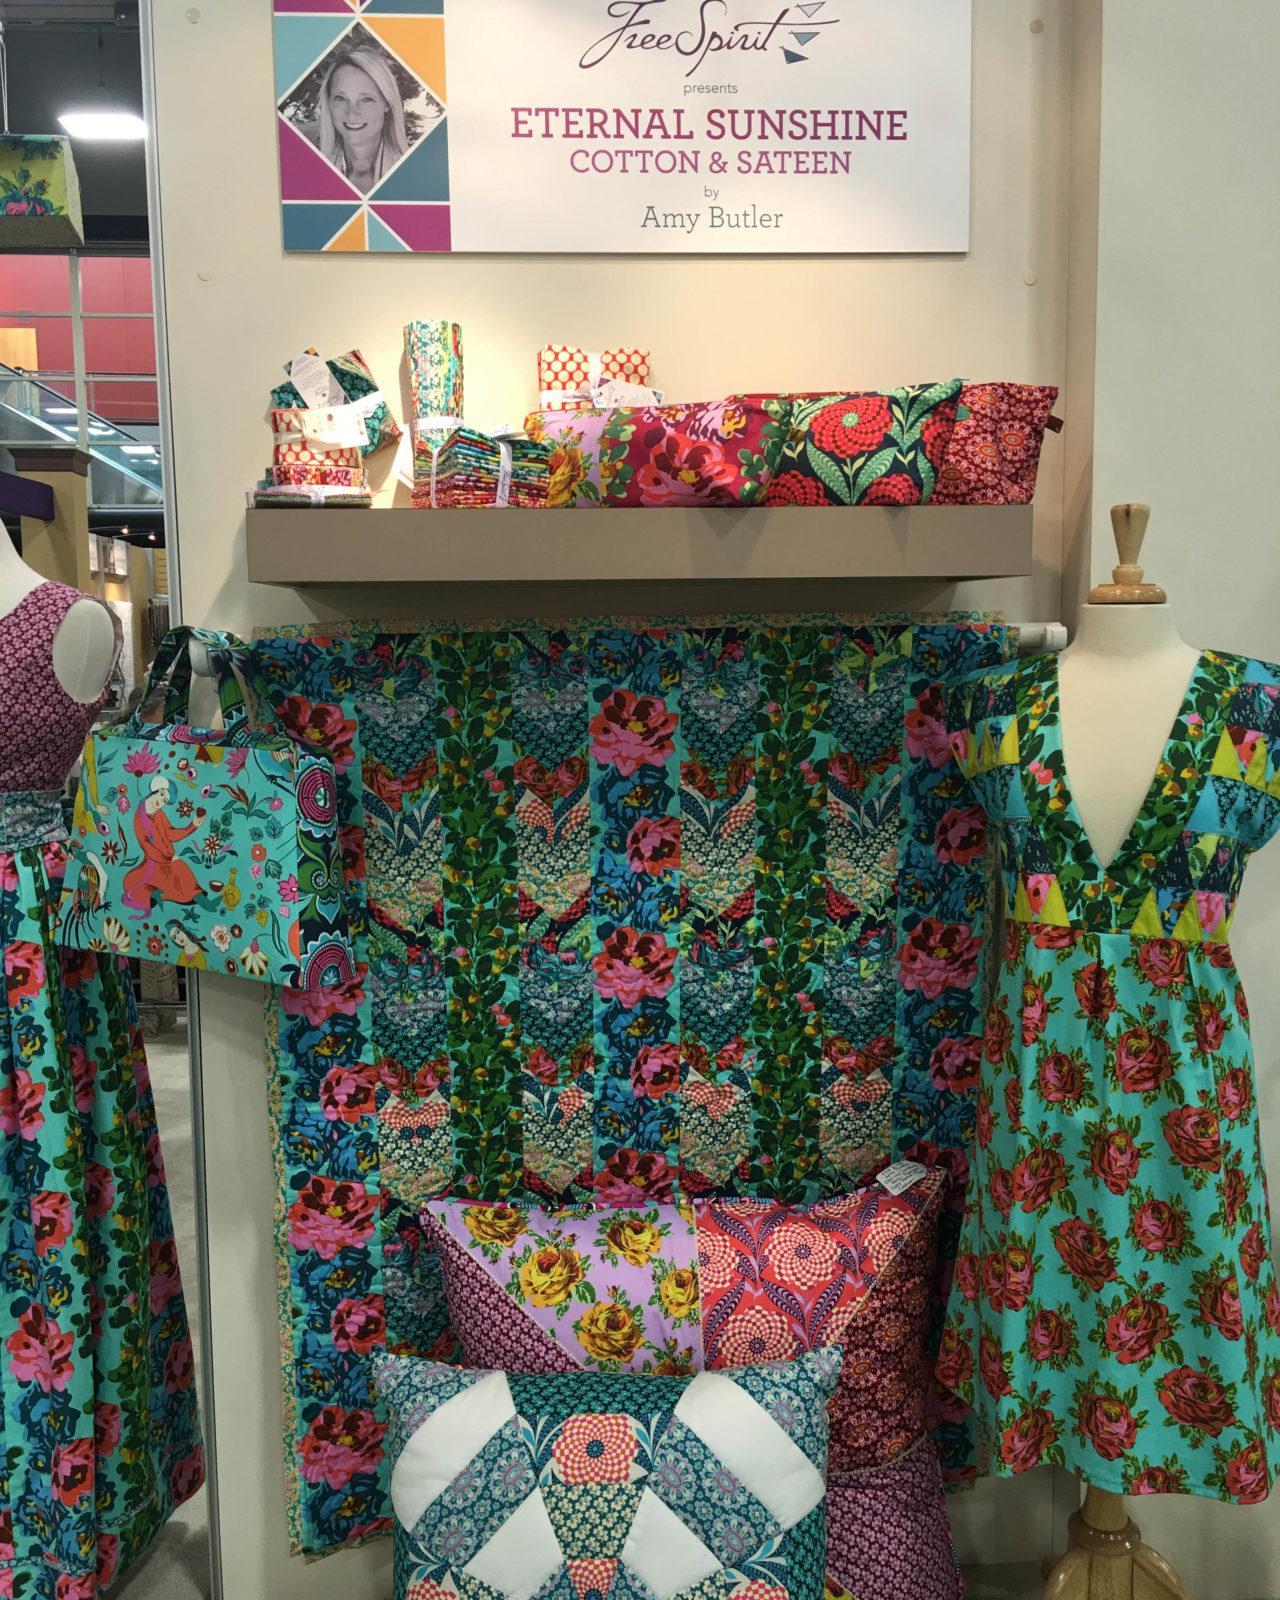 Amy Butler Eternal Sunshine Fabric Collection Inspiration Ideas